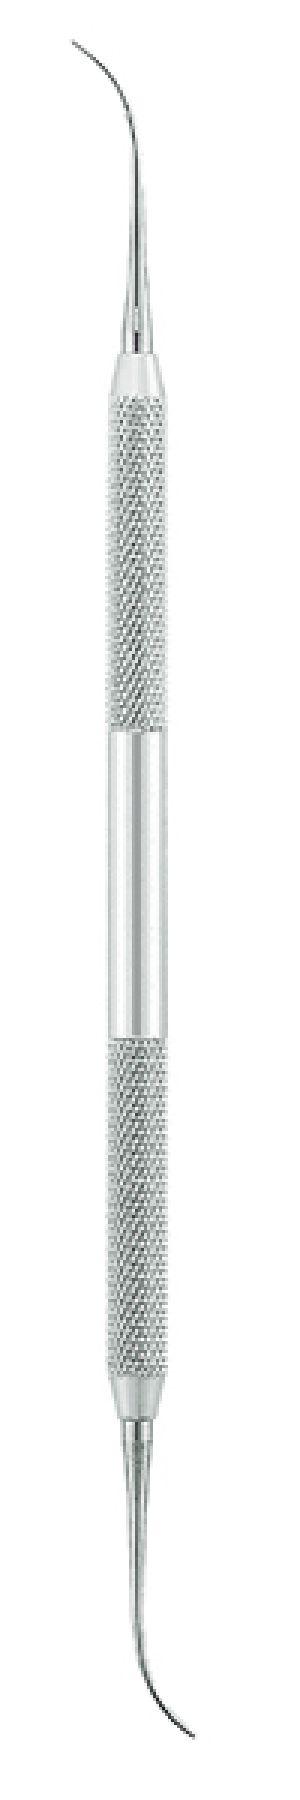 MI-73-102 Dental Wax & Modelling Carver